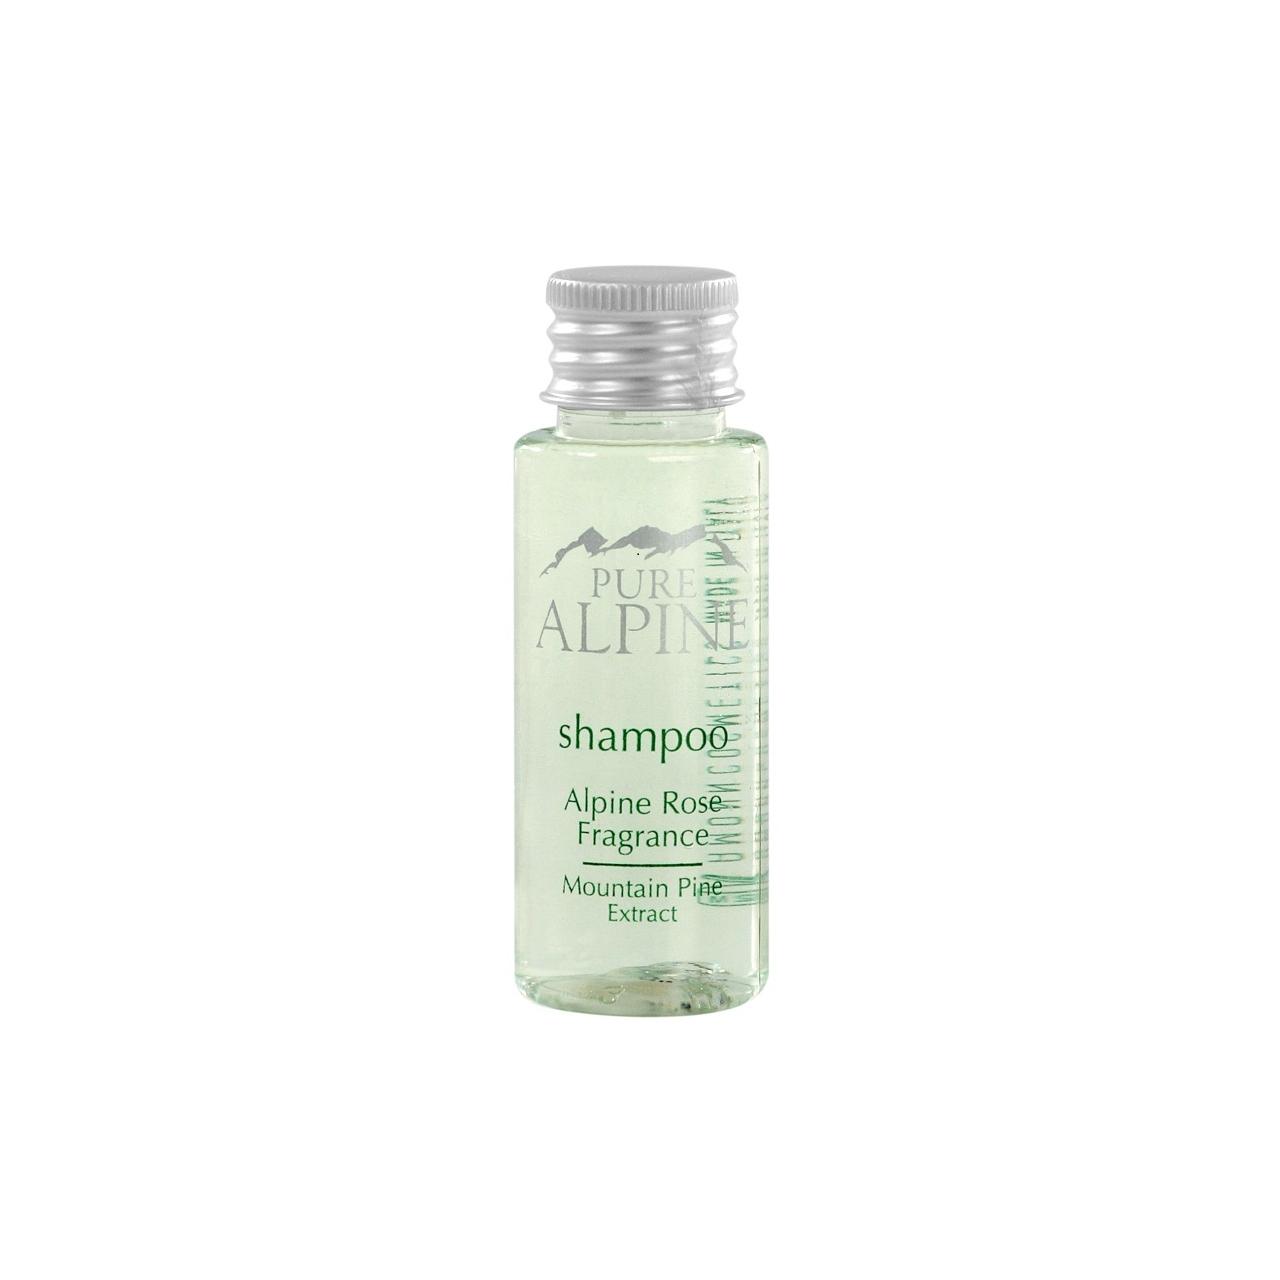 PURE ALPINE Shampoo 32ml im Flacon